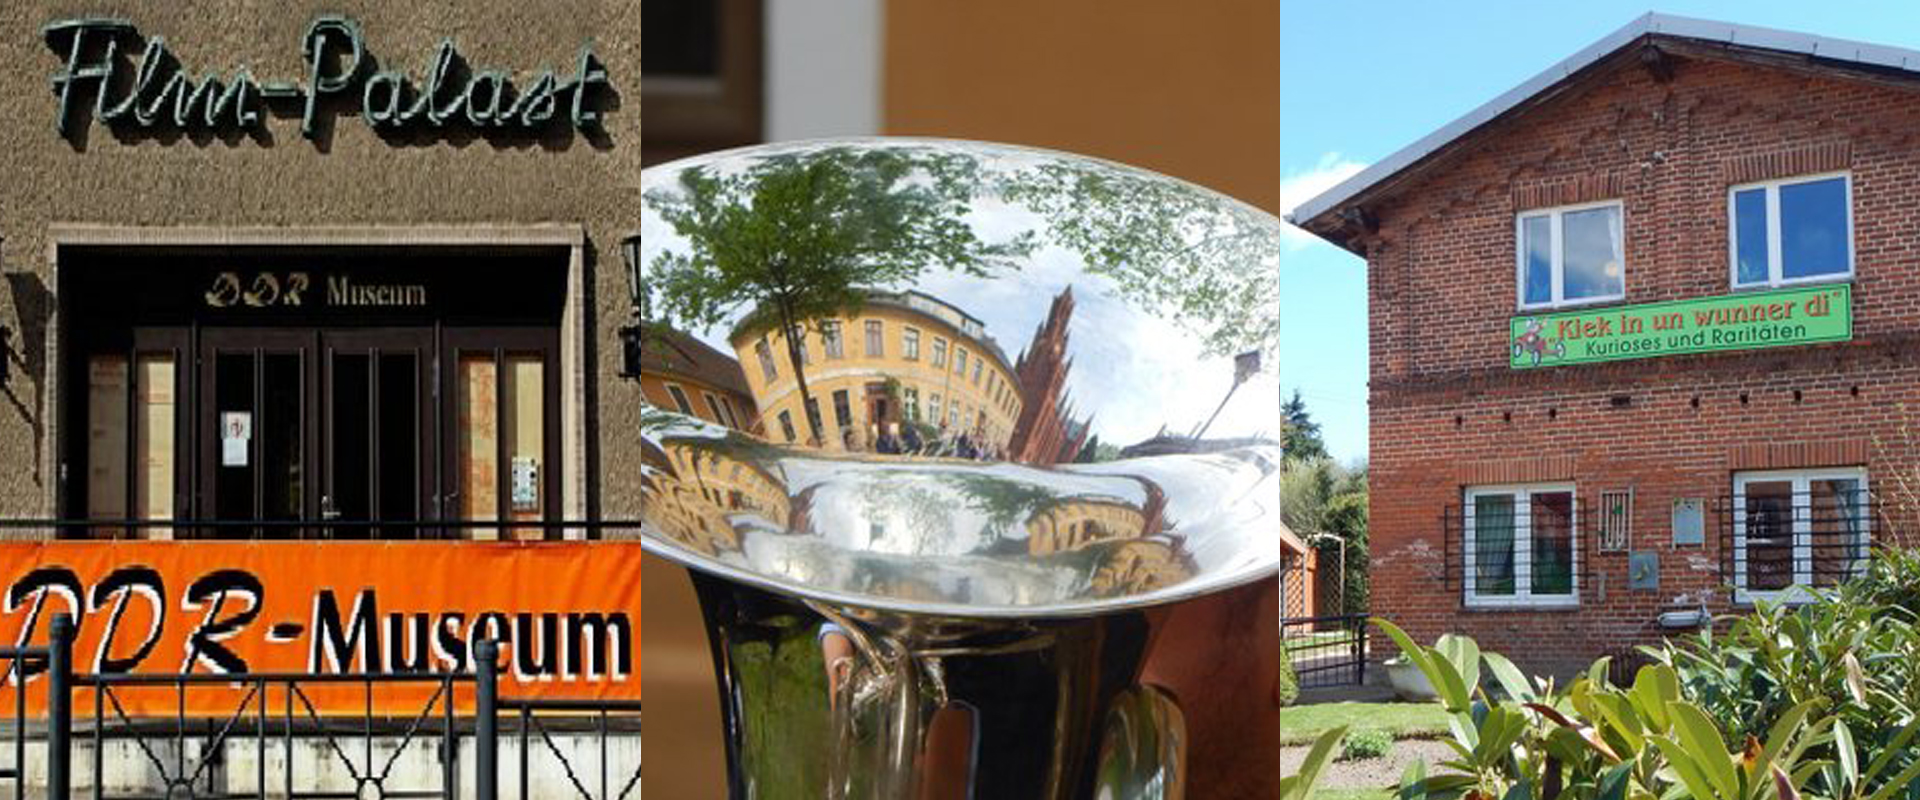 Permalink zu:Malchower Museen